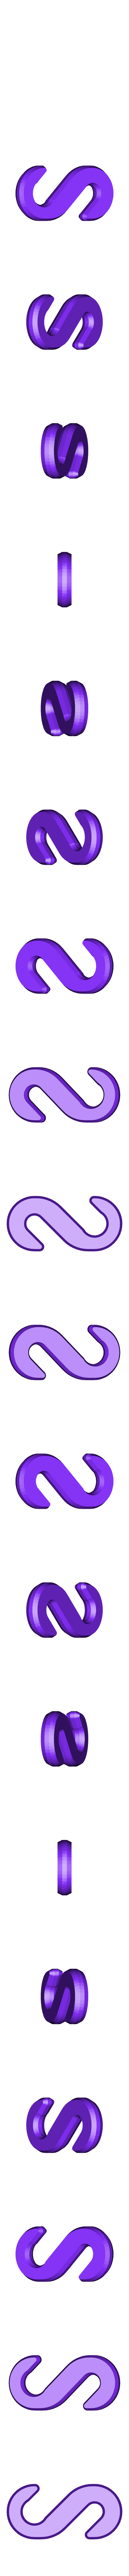 Haken.STL Download free STL file coat hanger • Model to 3D print, KarmaPrinting